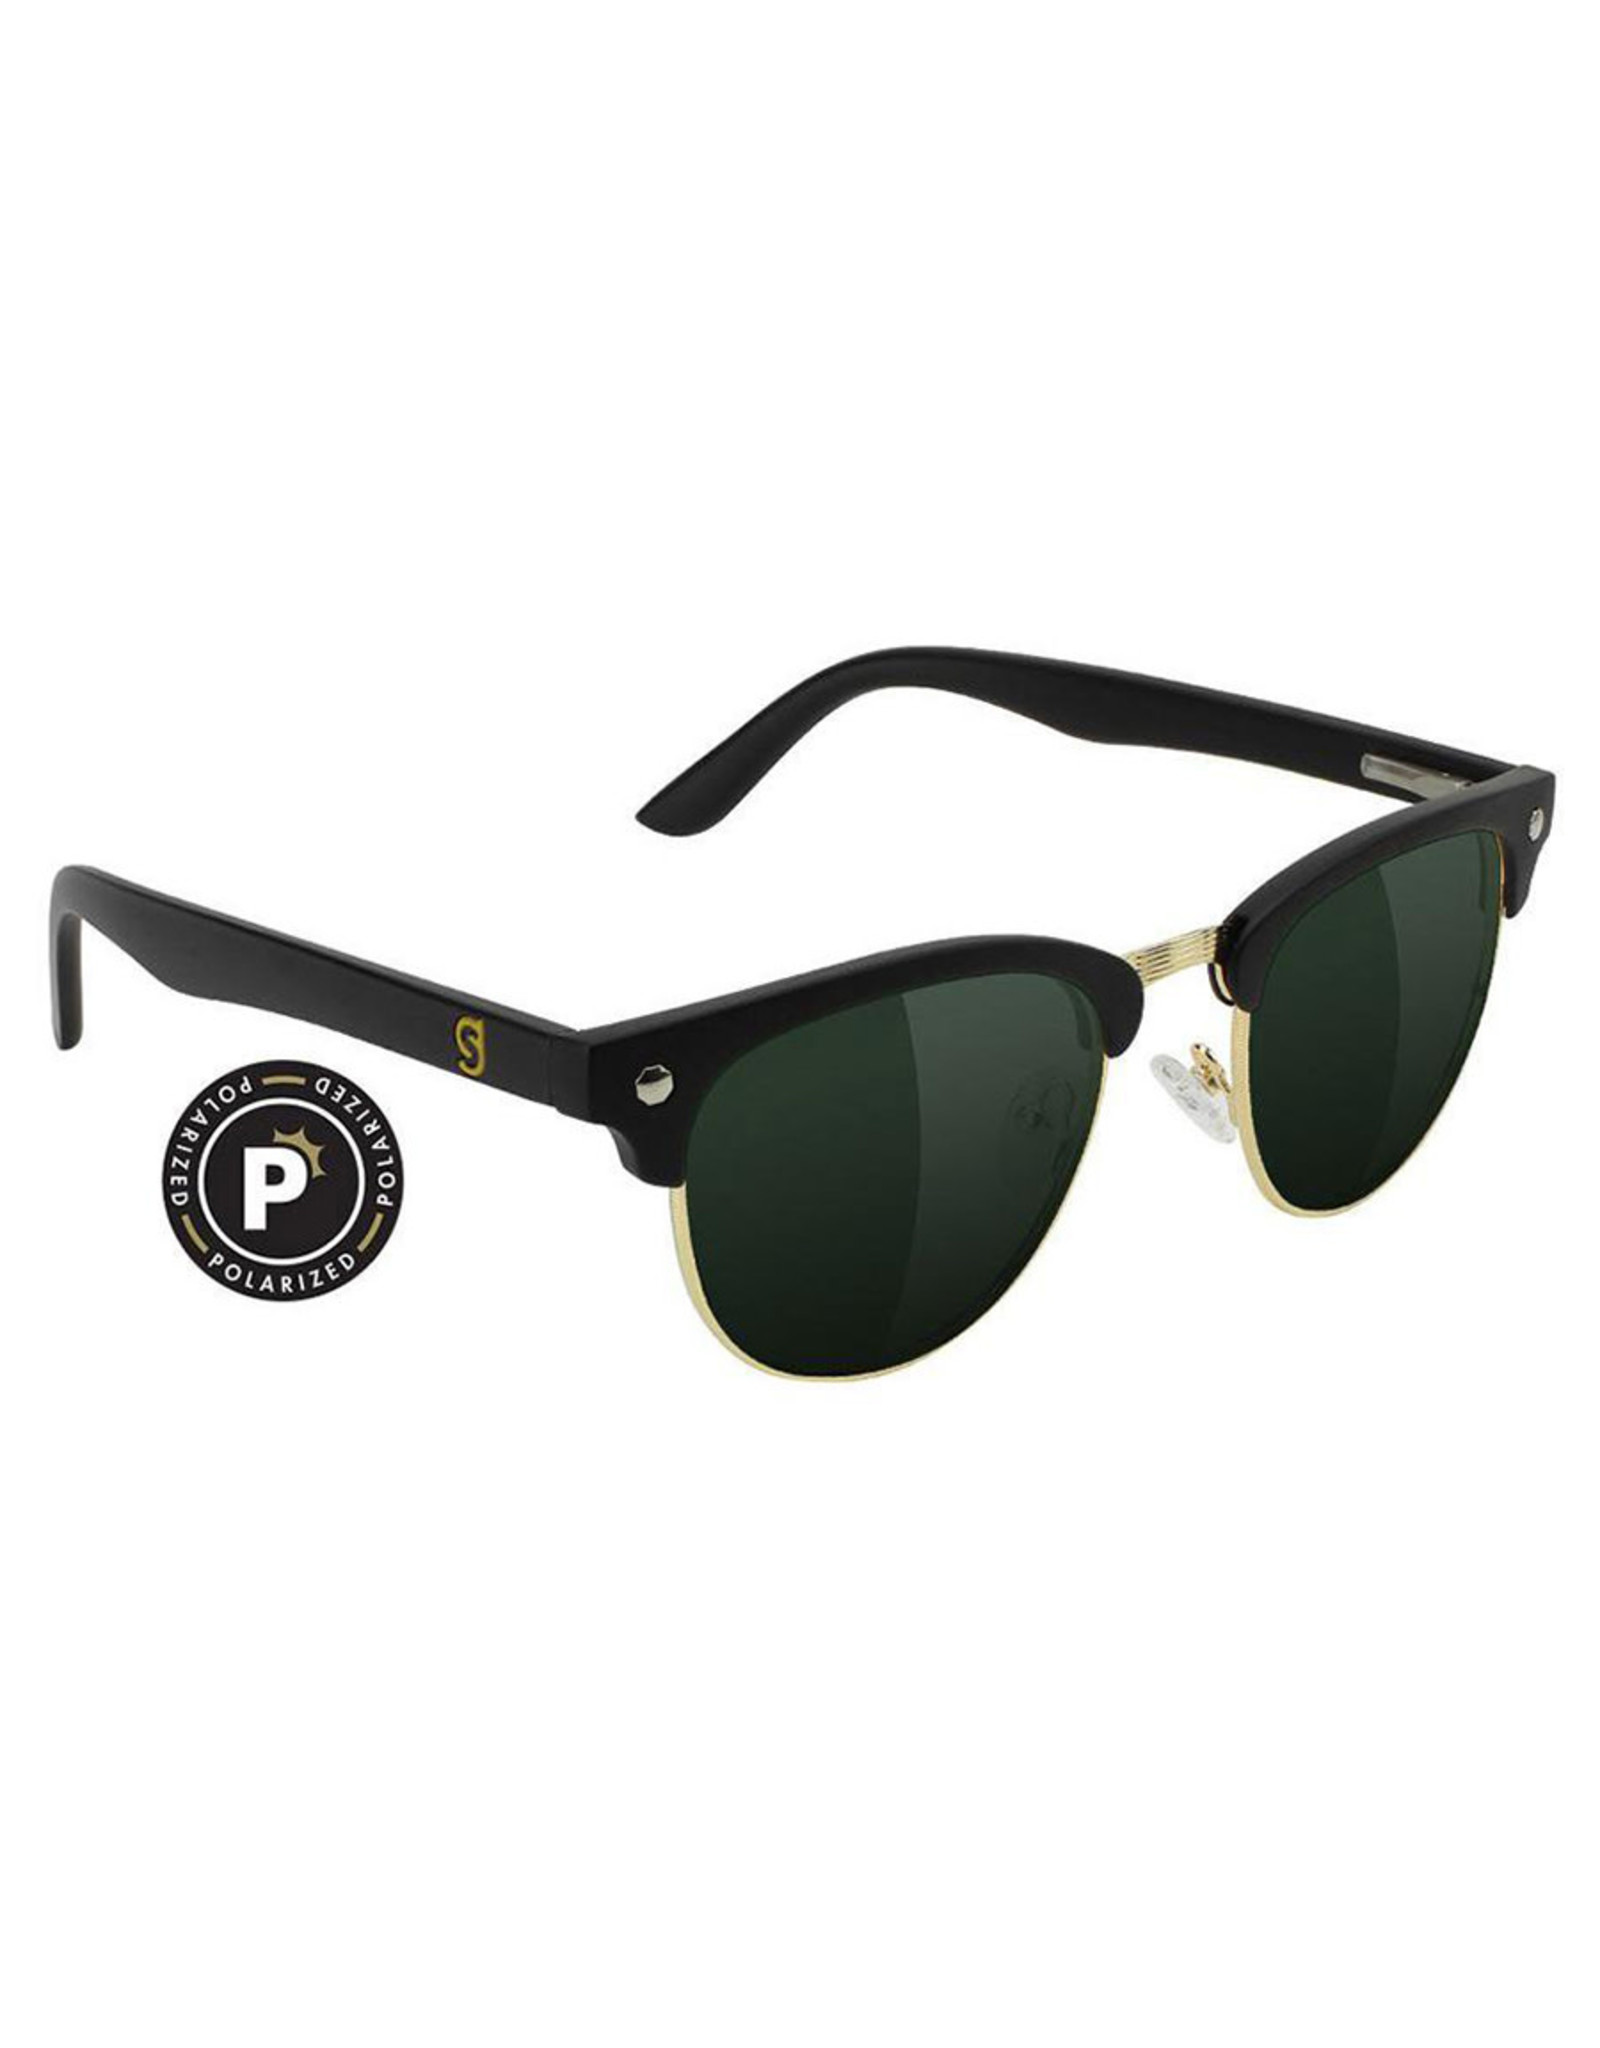 Glassy Sunglasses Glassy Sunglasses Morrison (Black Gloss/Brown Polarized Lens)